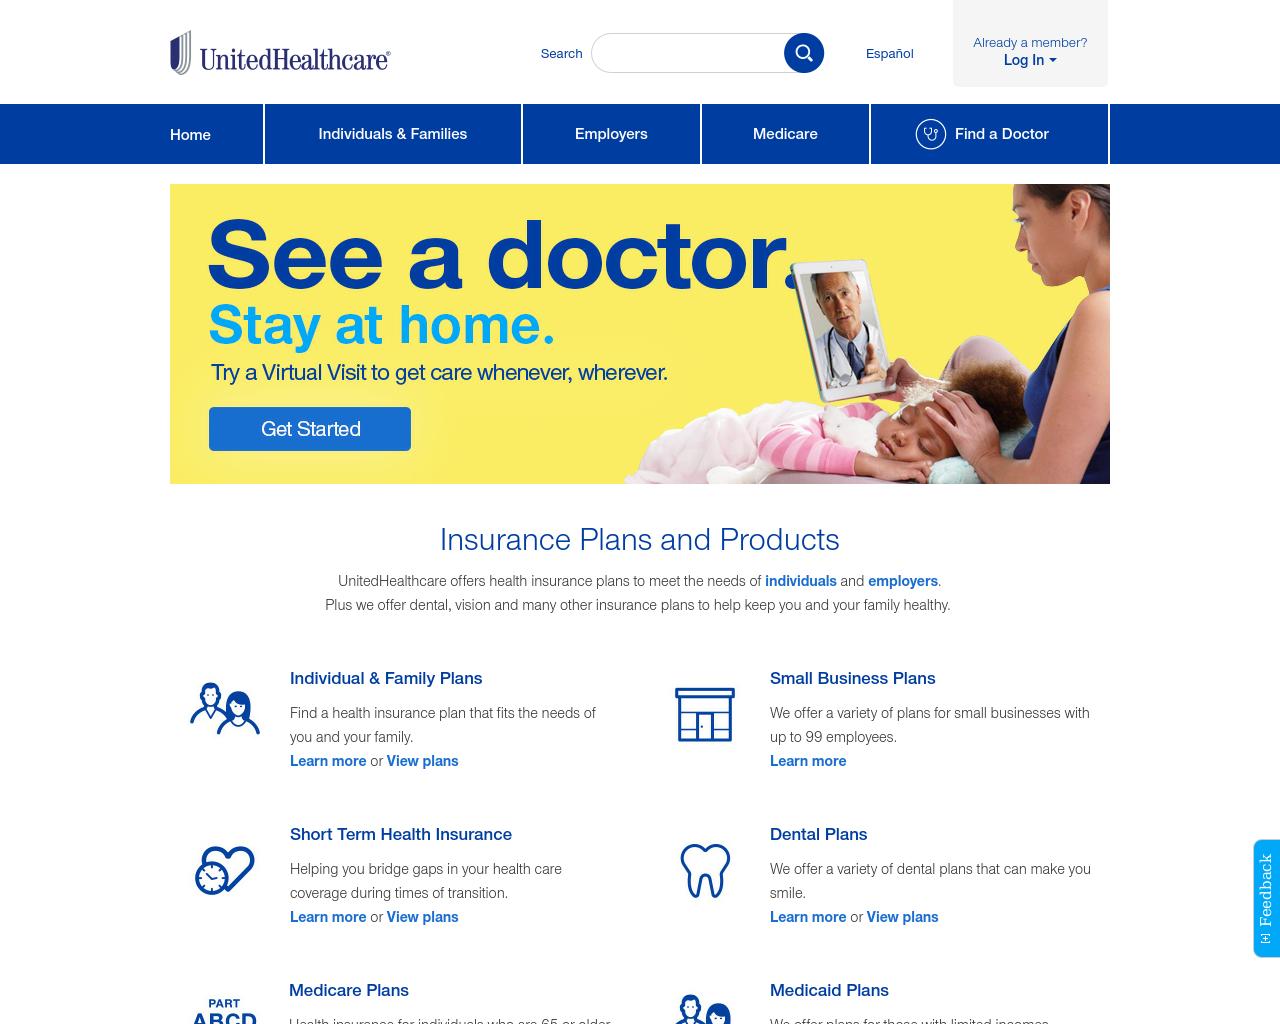 UnitedHealthcare-Advertising-Reviews-Pricing